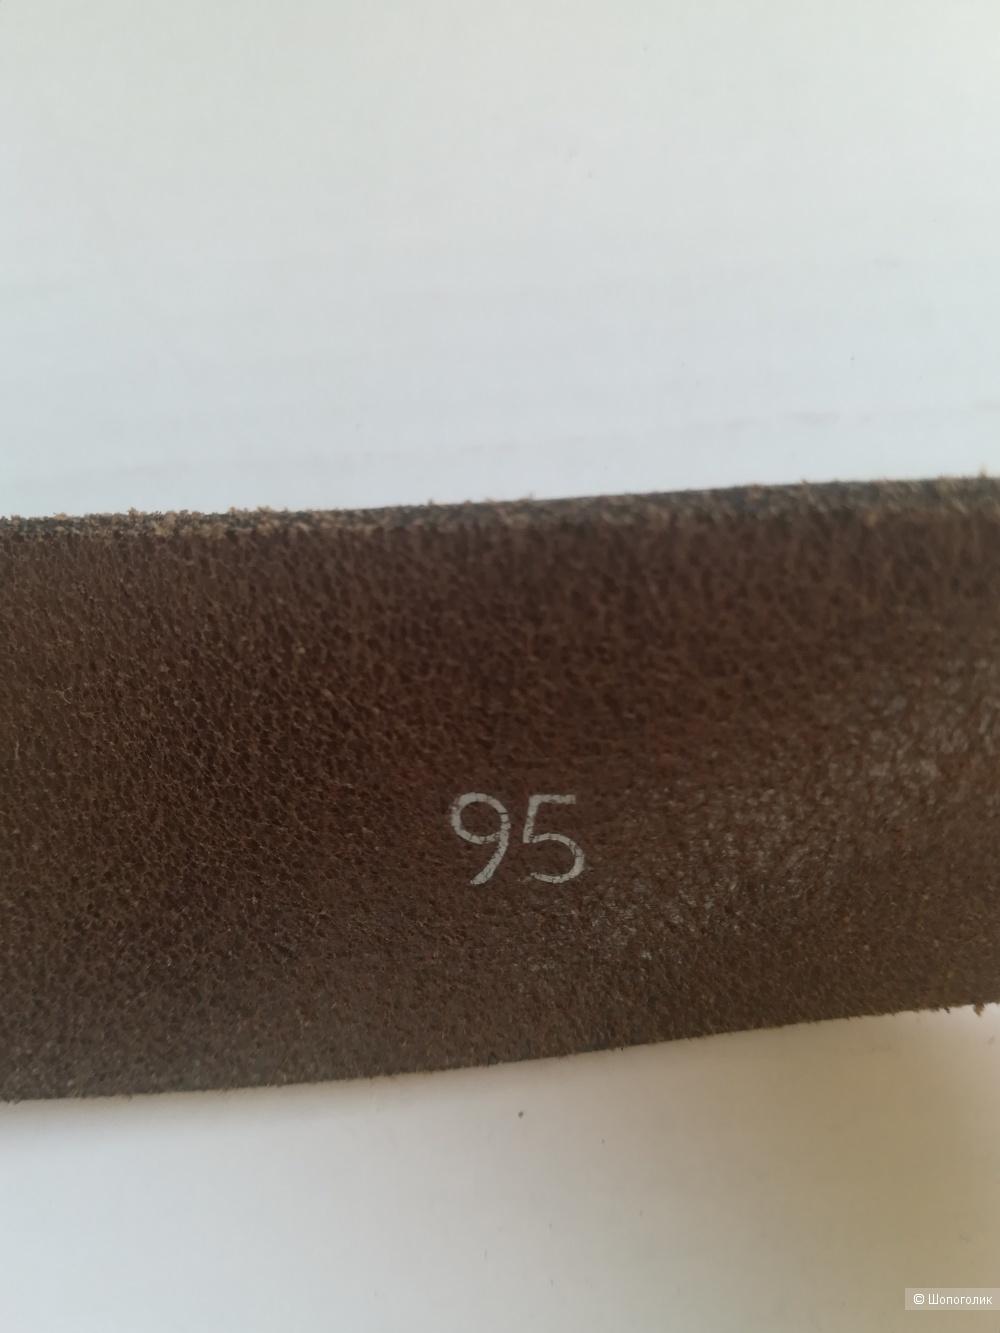 Ремень Verа  pelle, размер 95